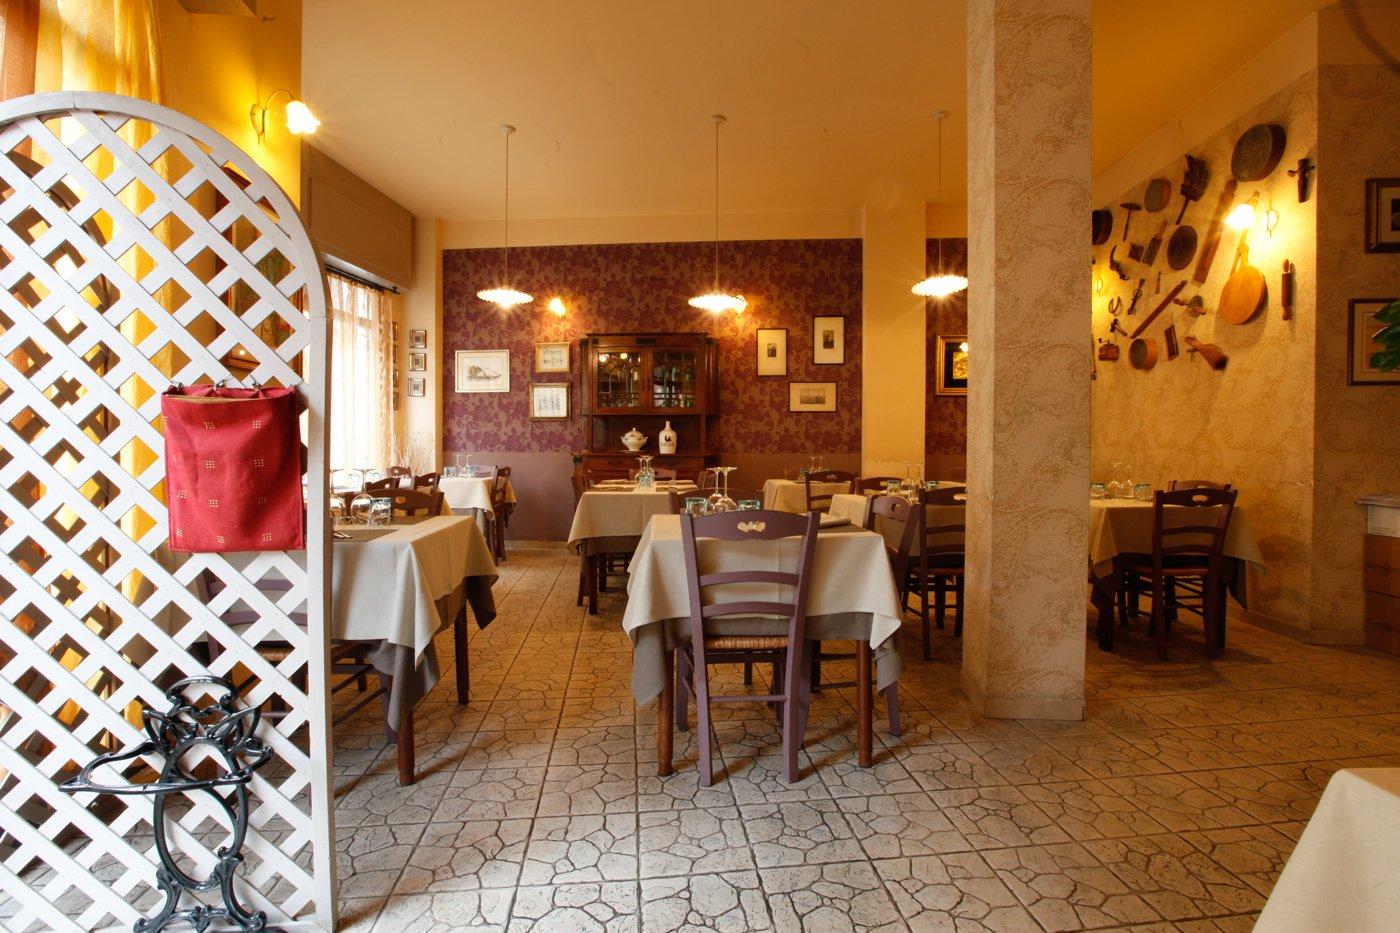 Cucina Romagnola  Ravenna  Trattoria La Rustica